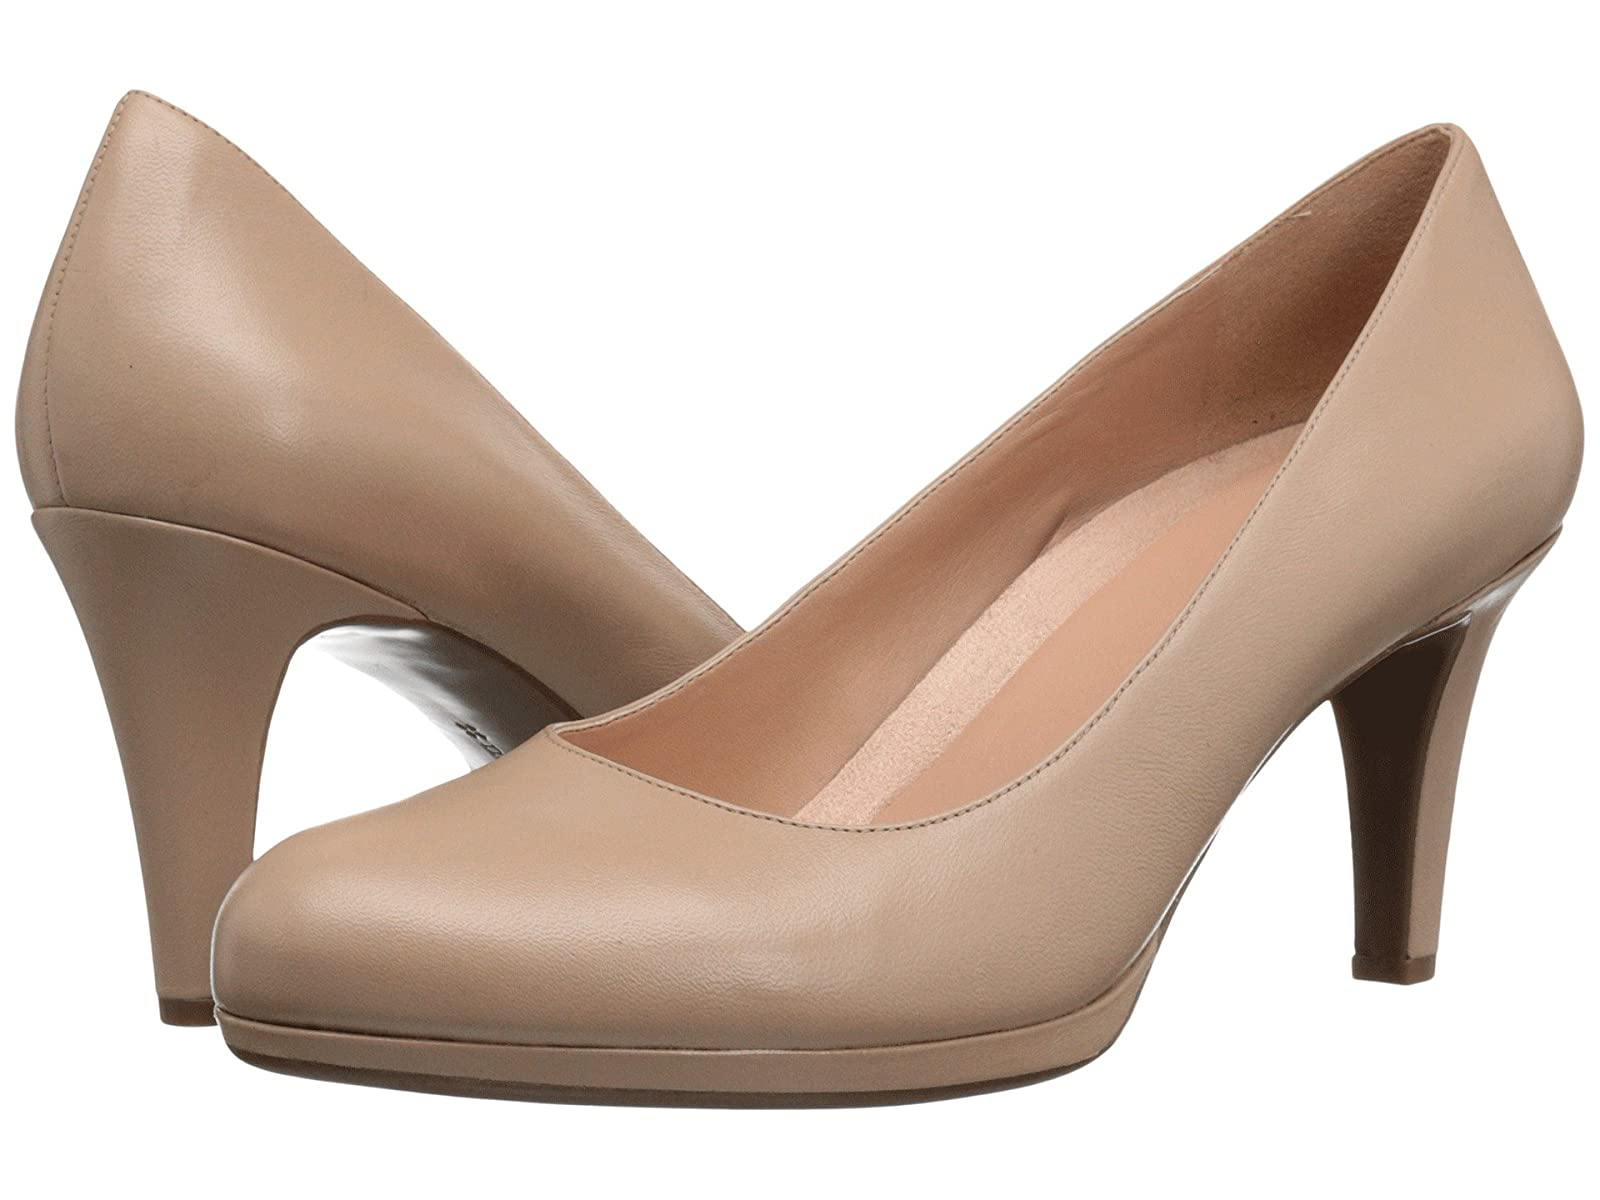 Naturalizer MichelleAtmospheric grades have affordable shoes